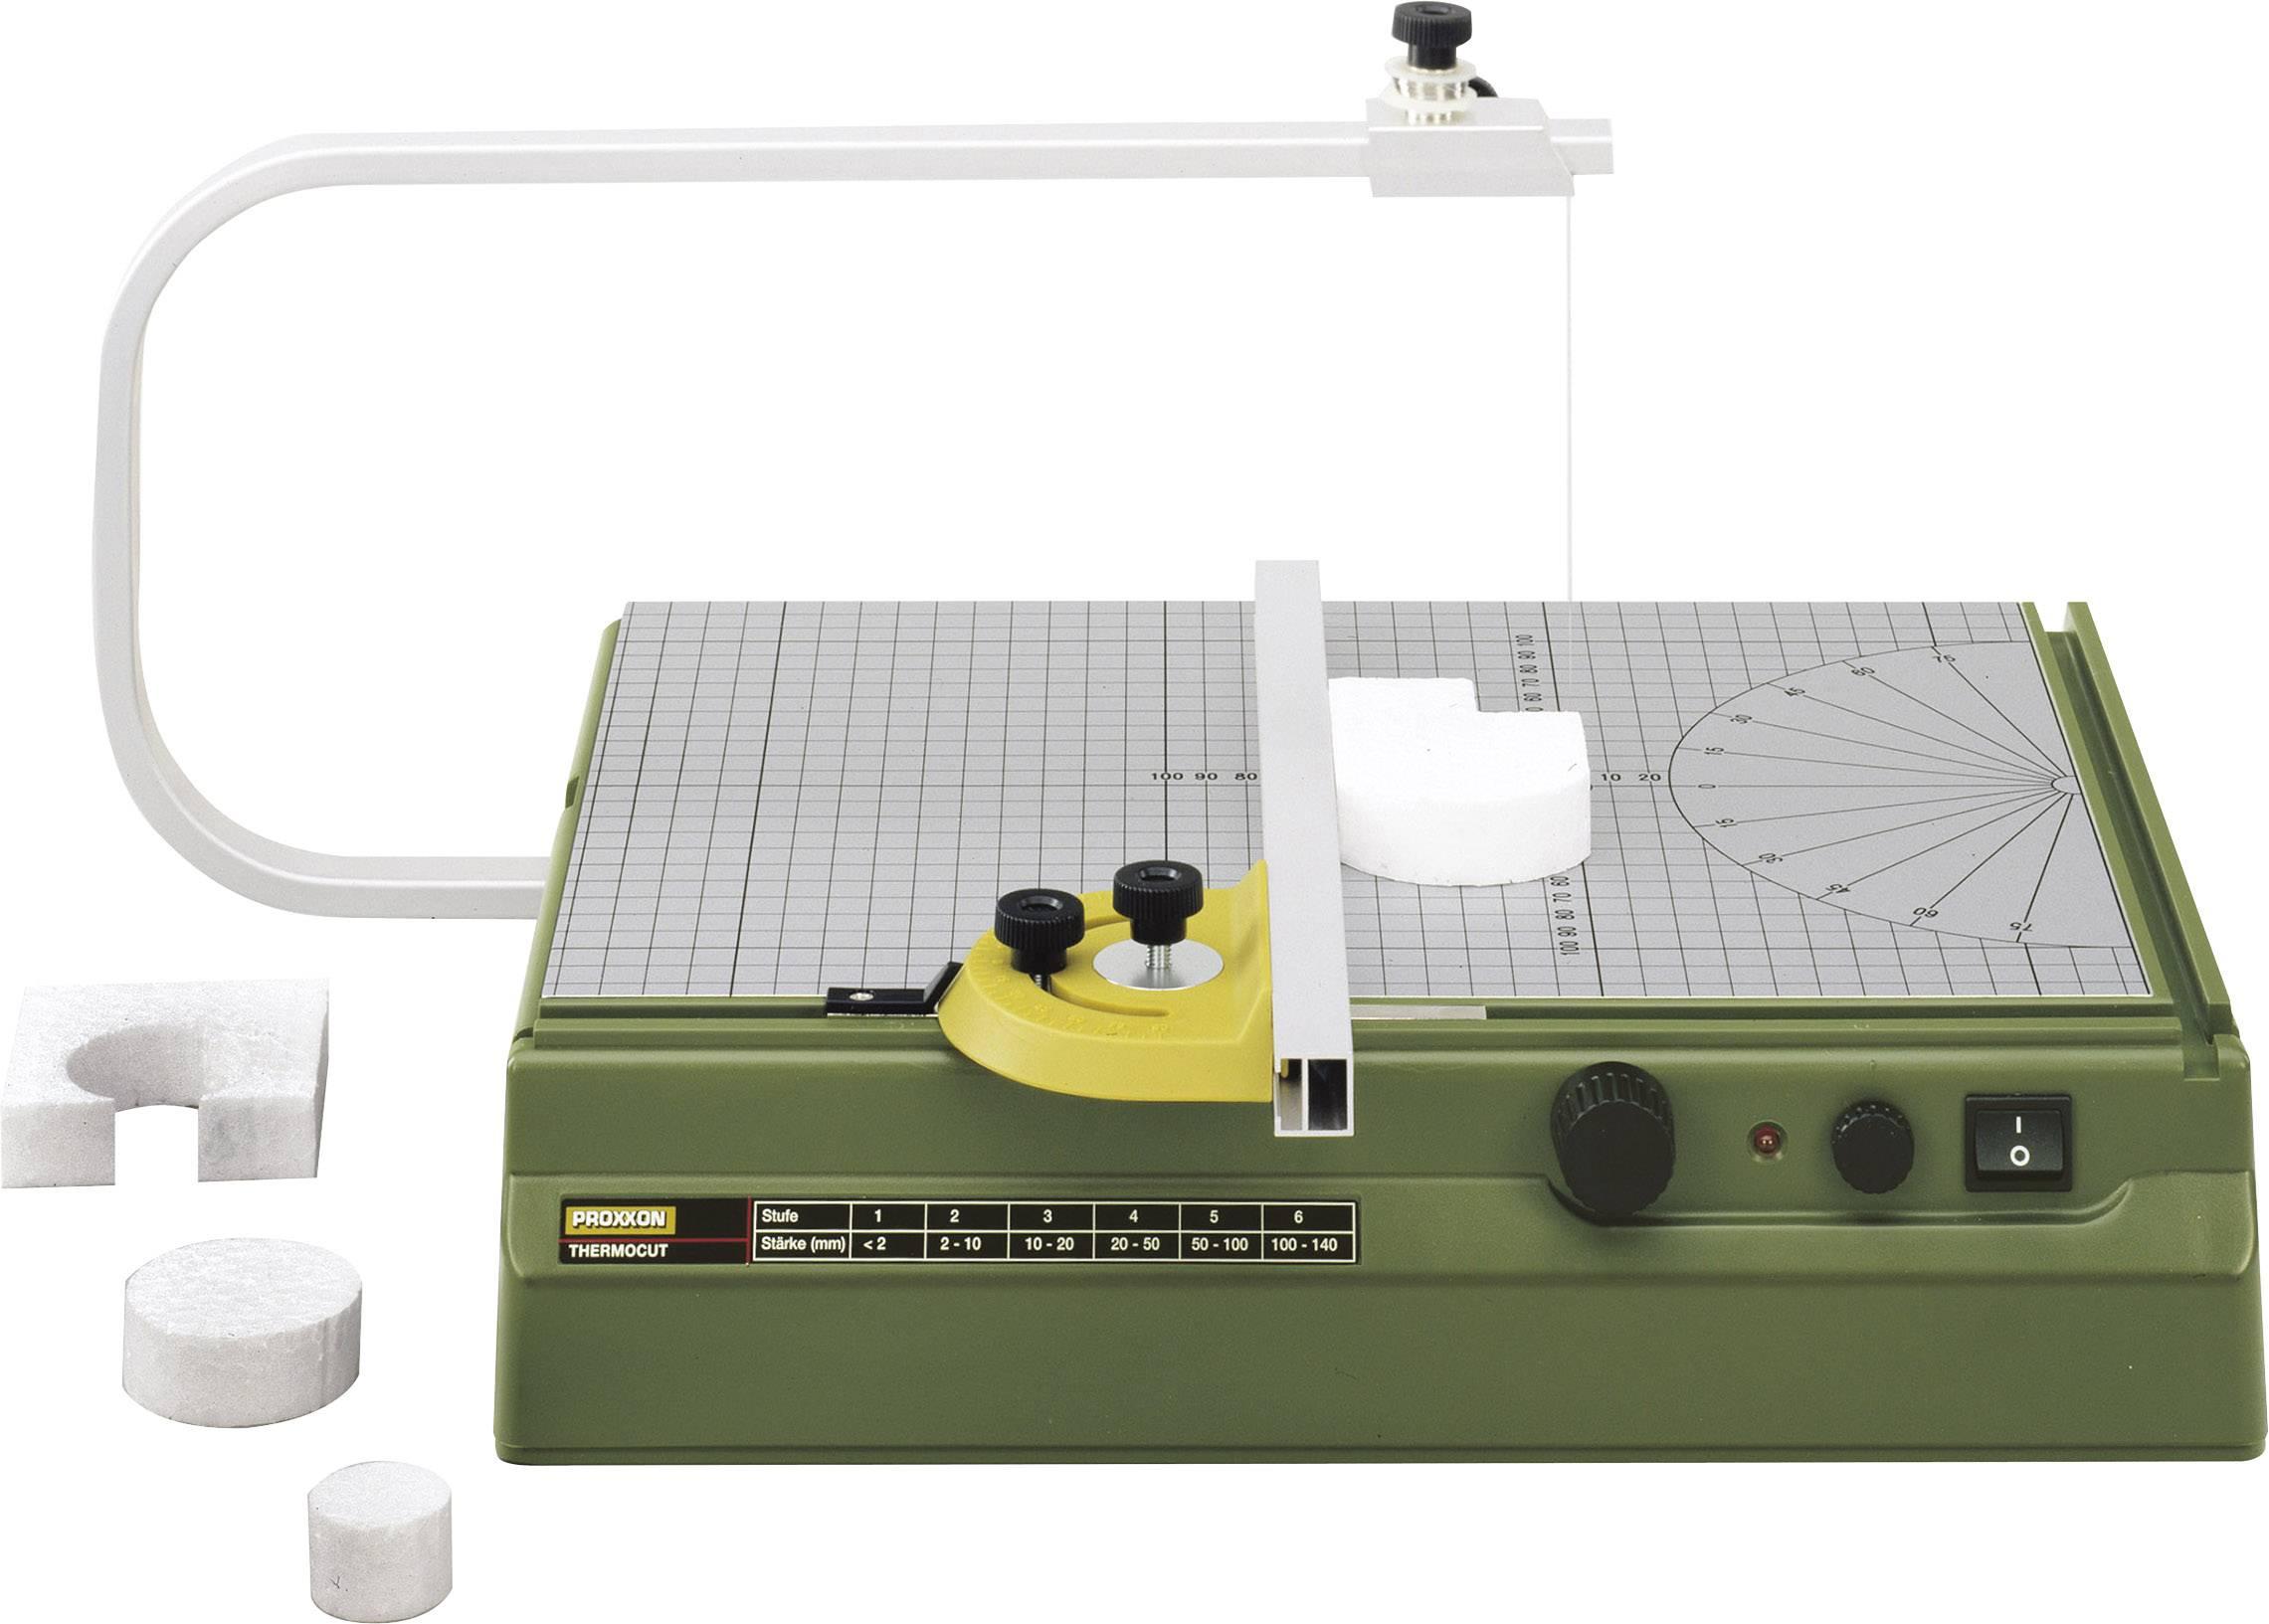 Rezačka na polystyrén Proxxon Micromot 230/E, 20 W